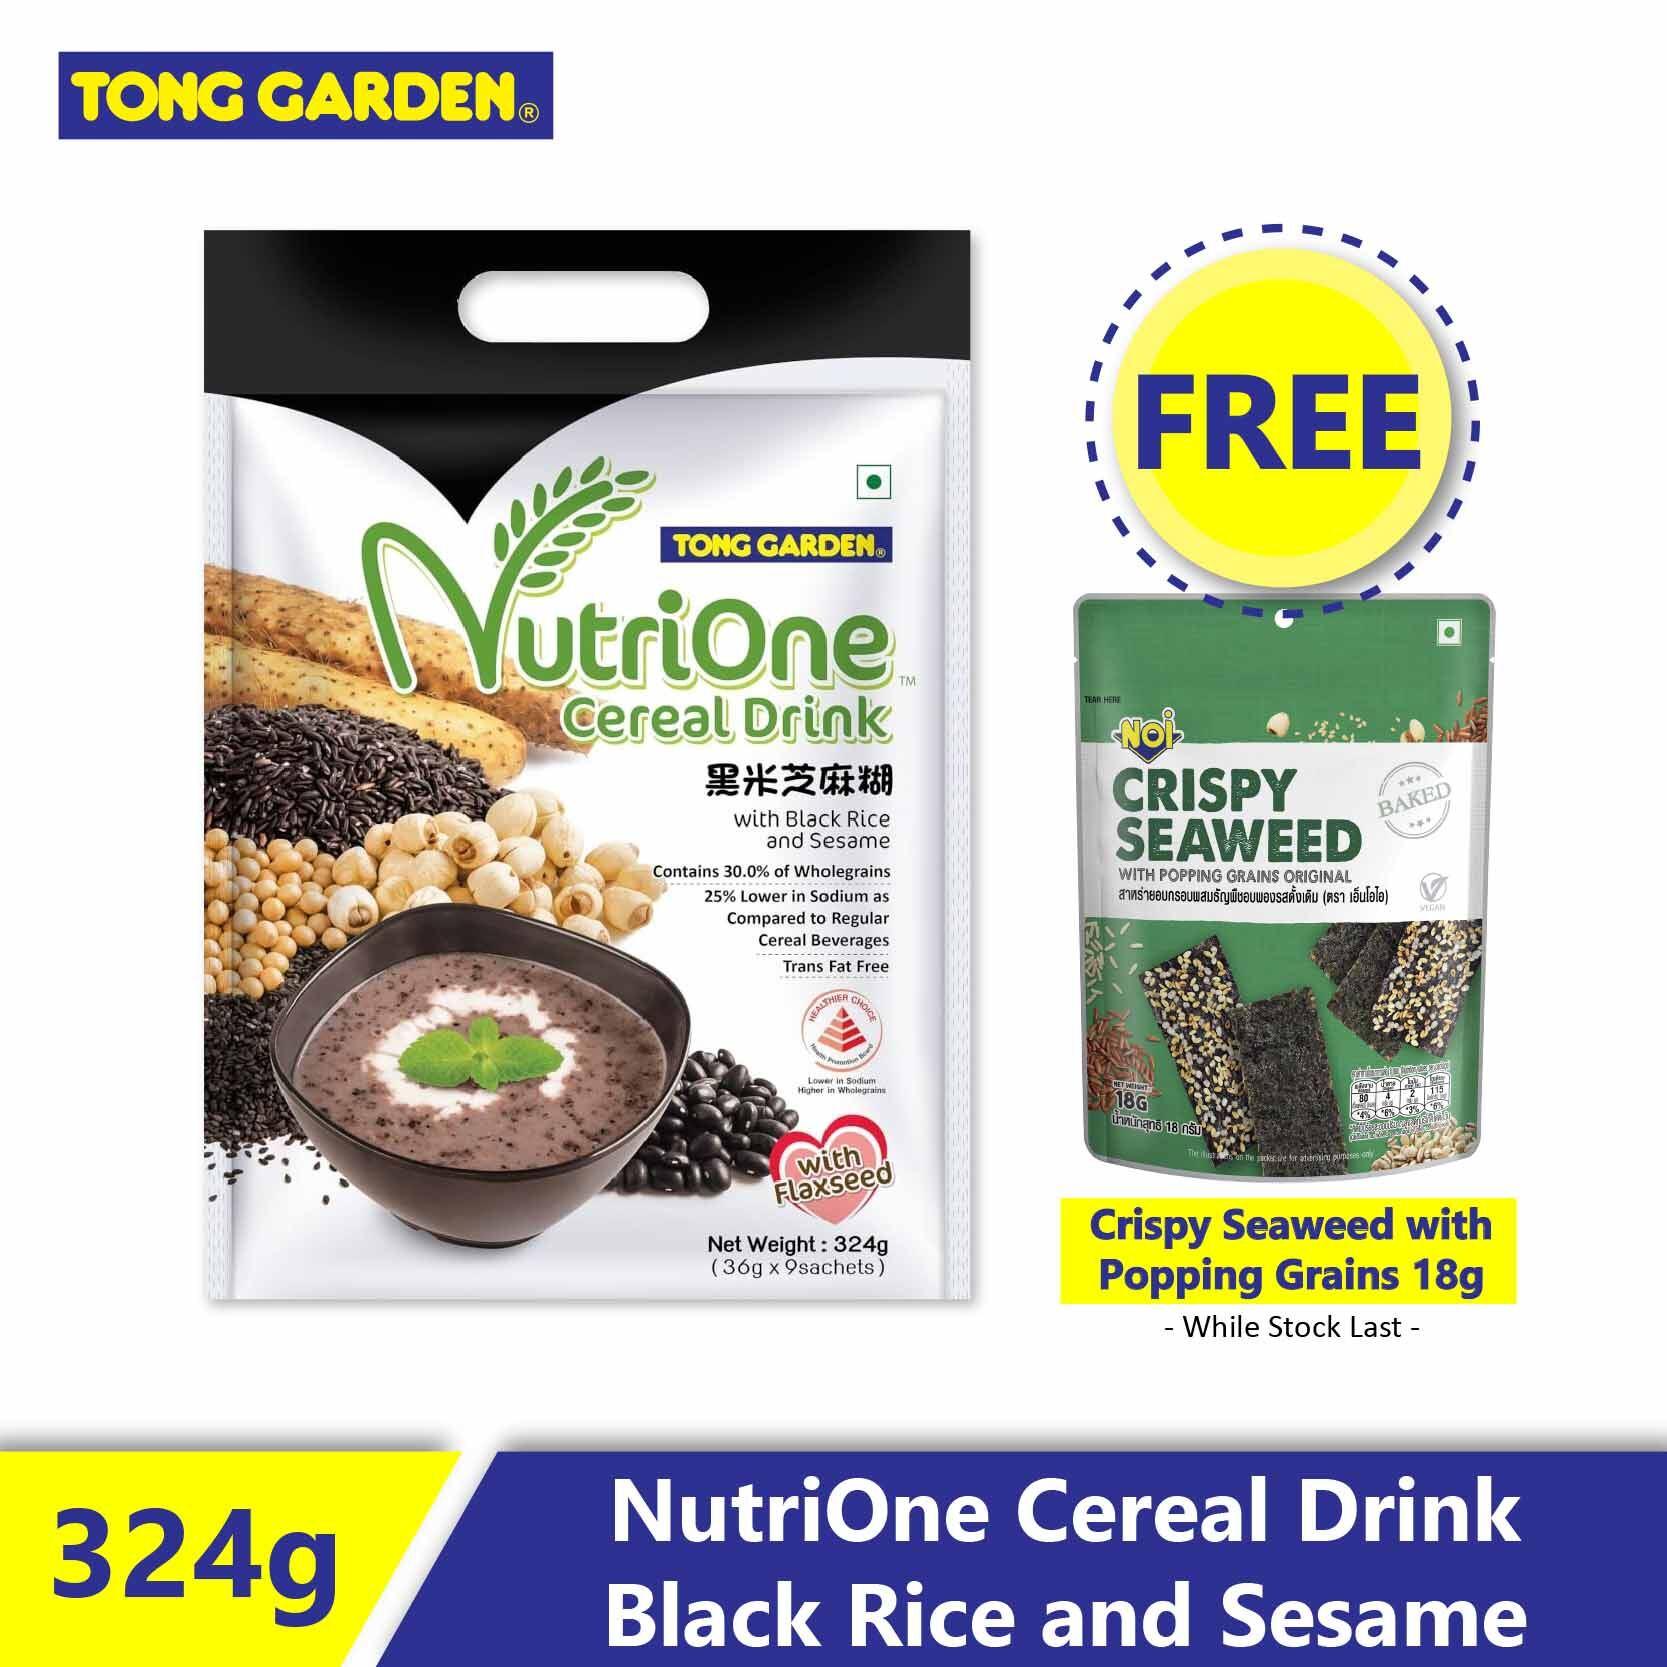 NutriOne Cereal Drink Black Rice and Sesame FOC Seaweed 18g